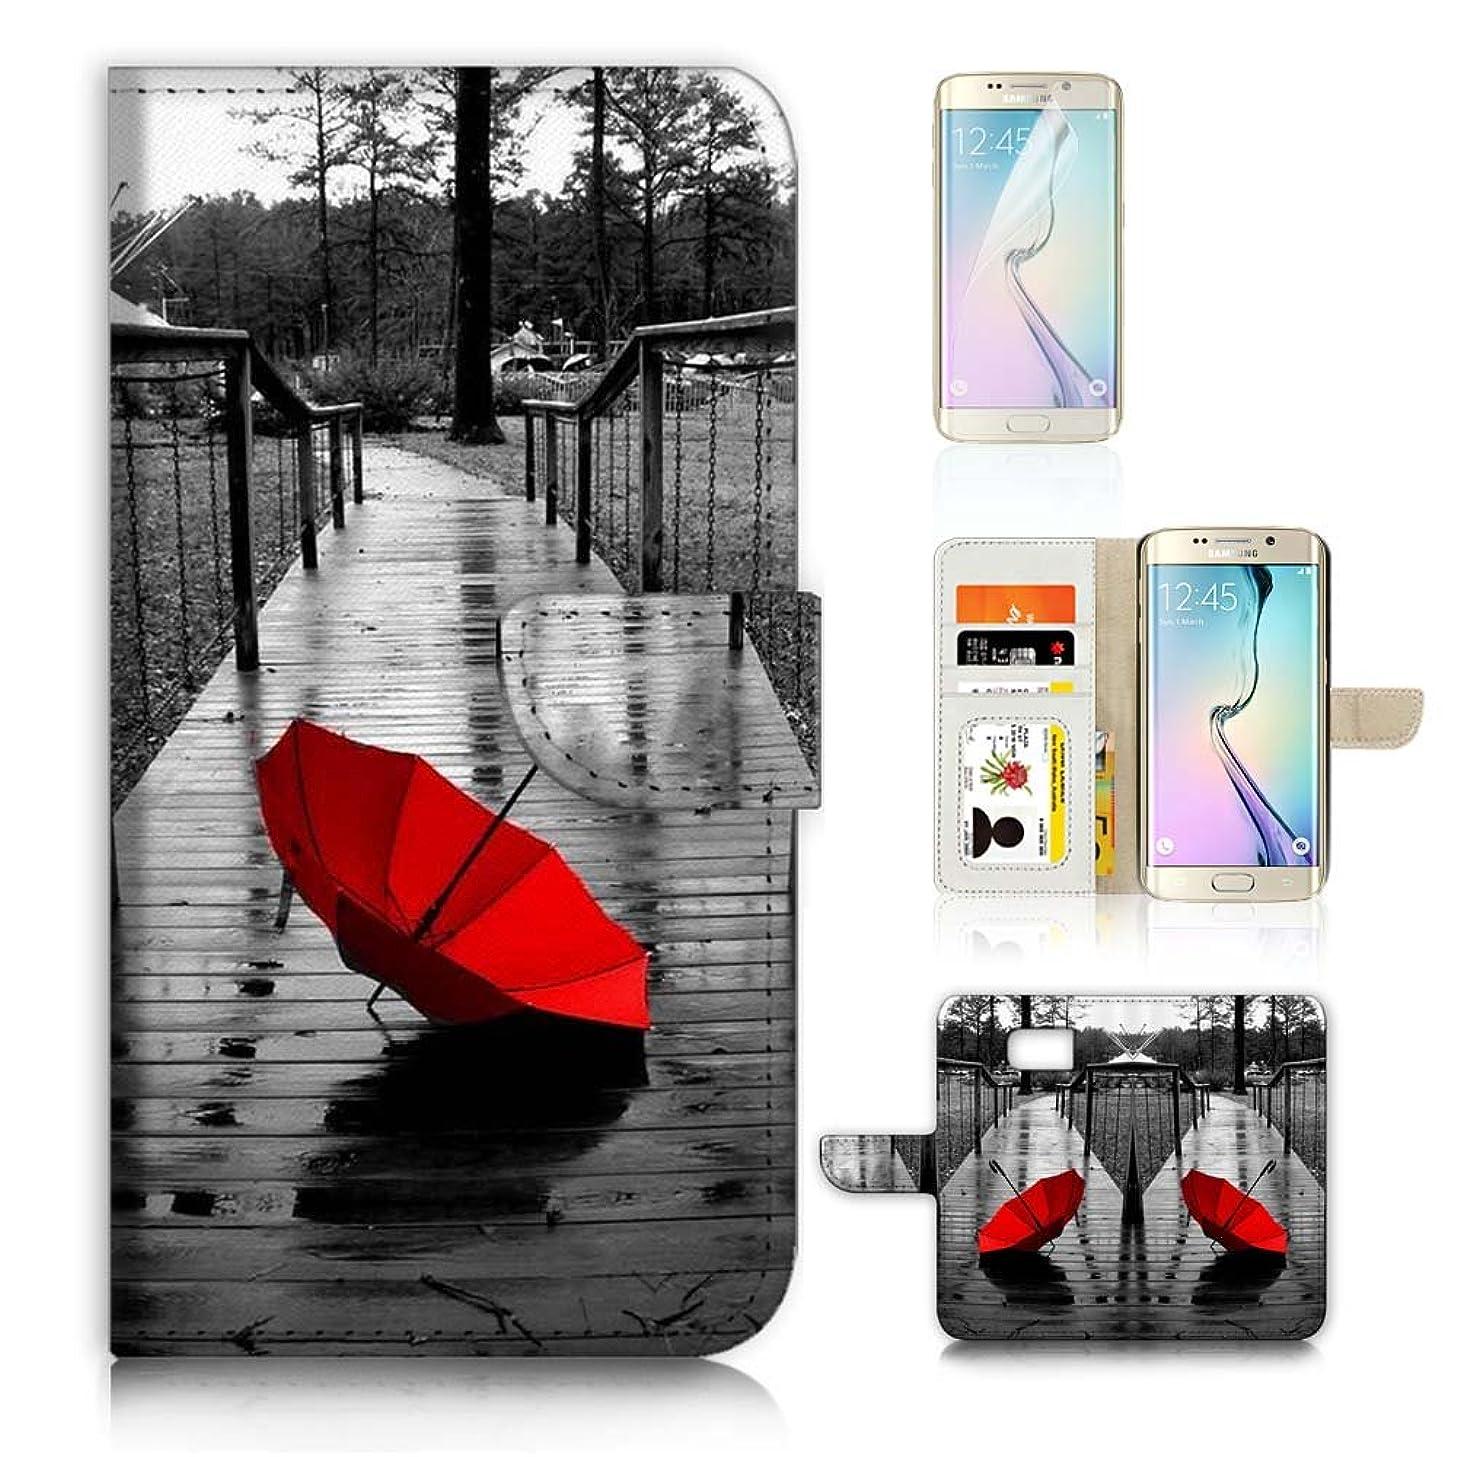 ( For Samsung S7 Edge , Galaxy S7 Edge ) Flip Wallet Case Cover & Screen Protector Bundle - A20112 Red Umbrella